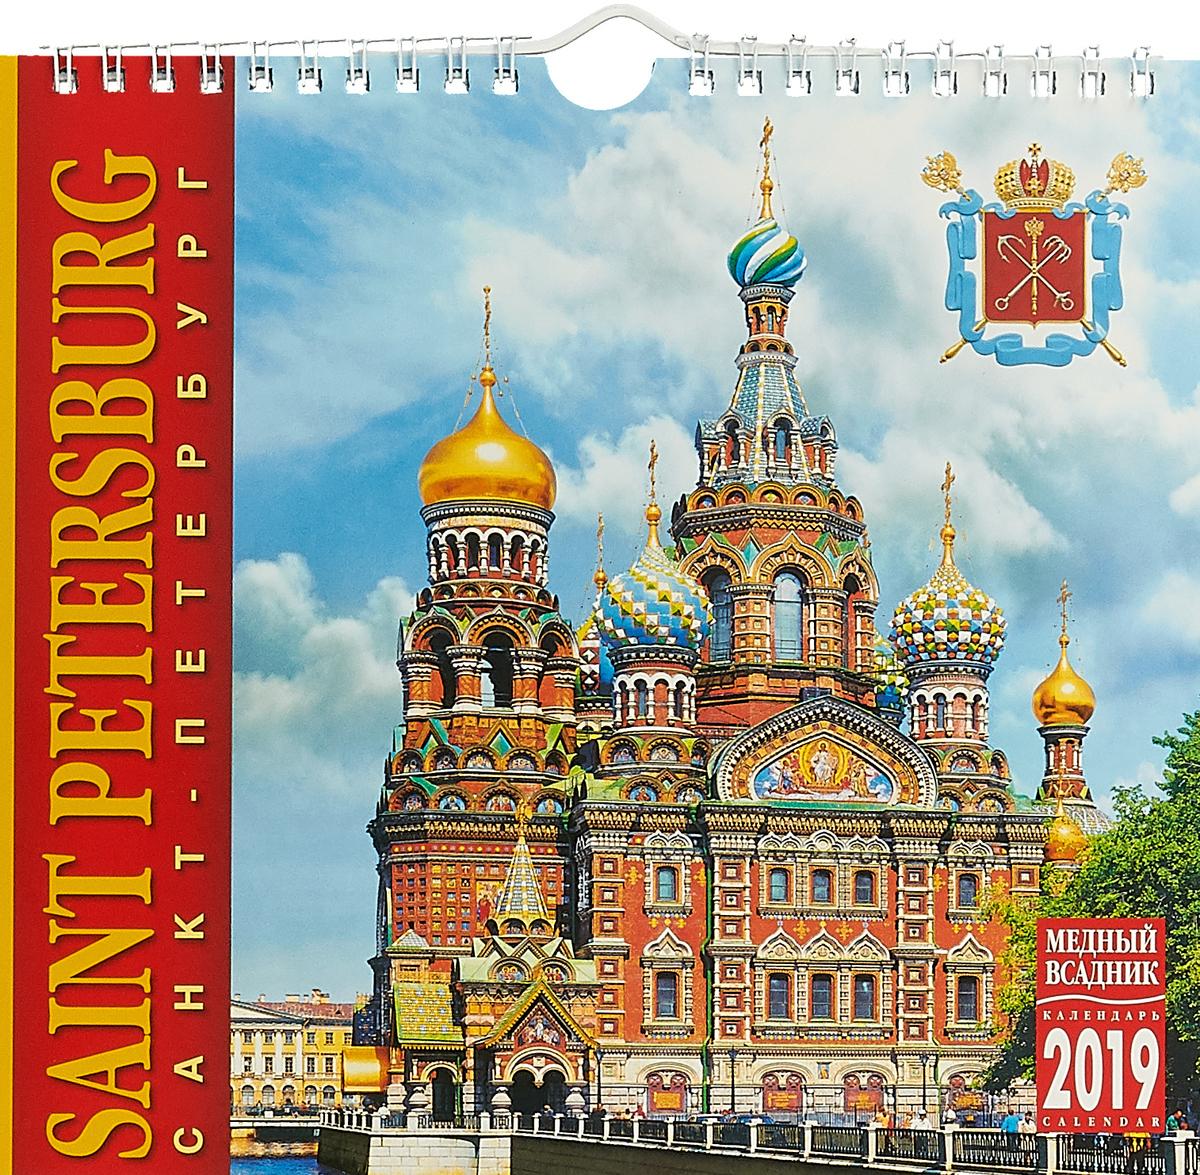 Календарь на спирали на 2019 год. Санкт-Петербург. Спас на Крови календарь 2018 на спирали венценосная семья